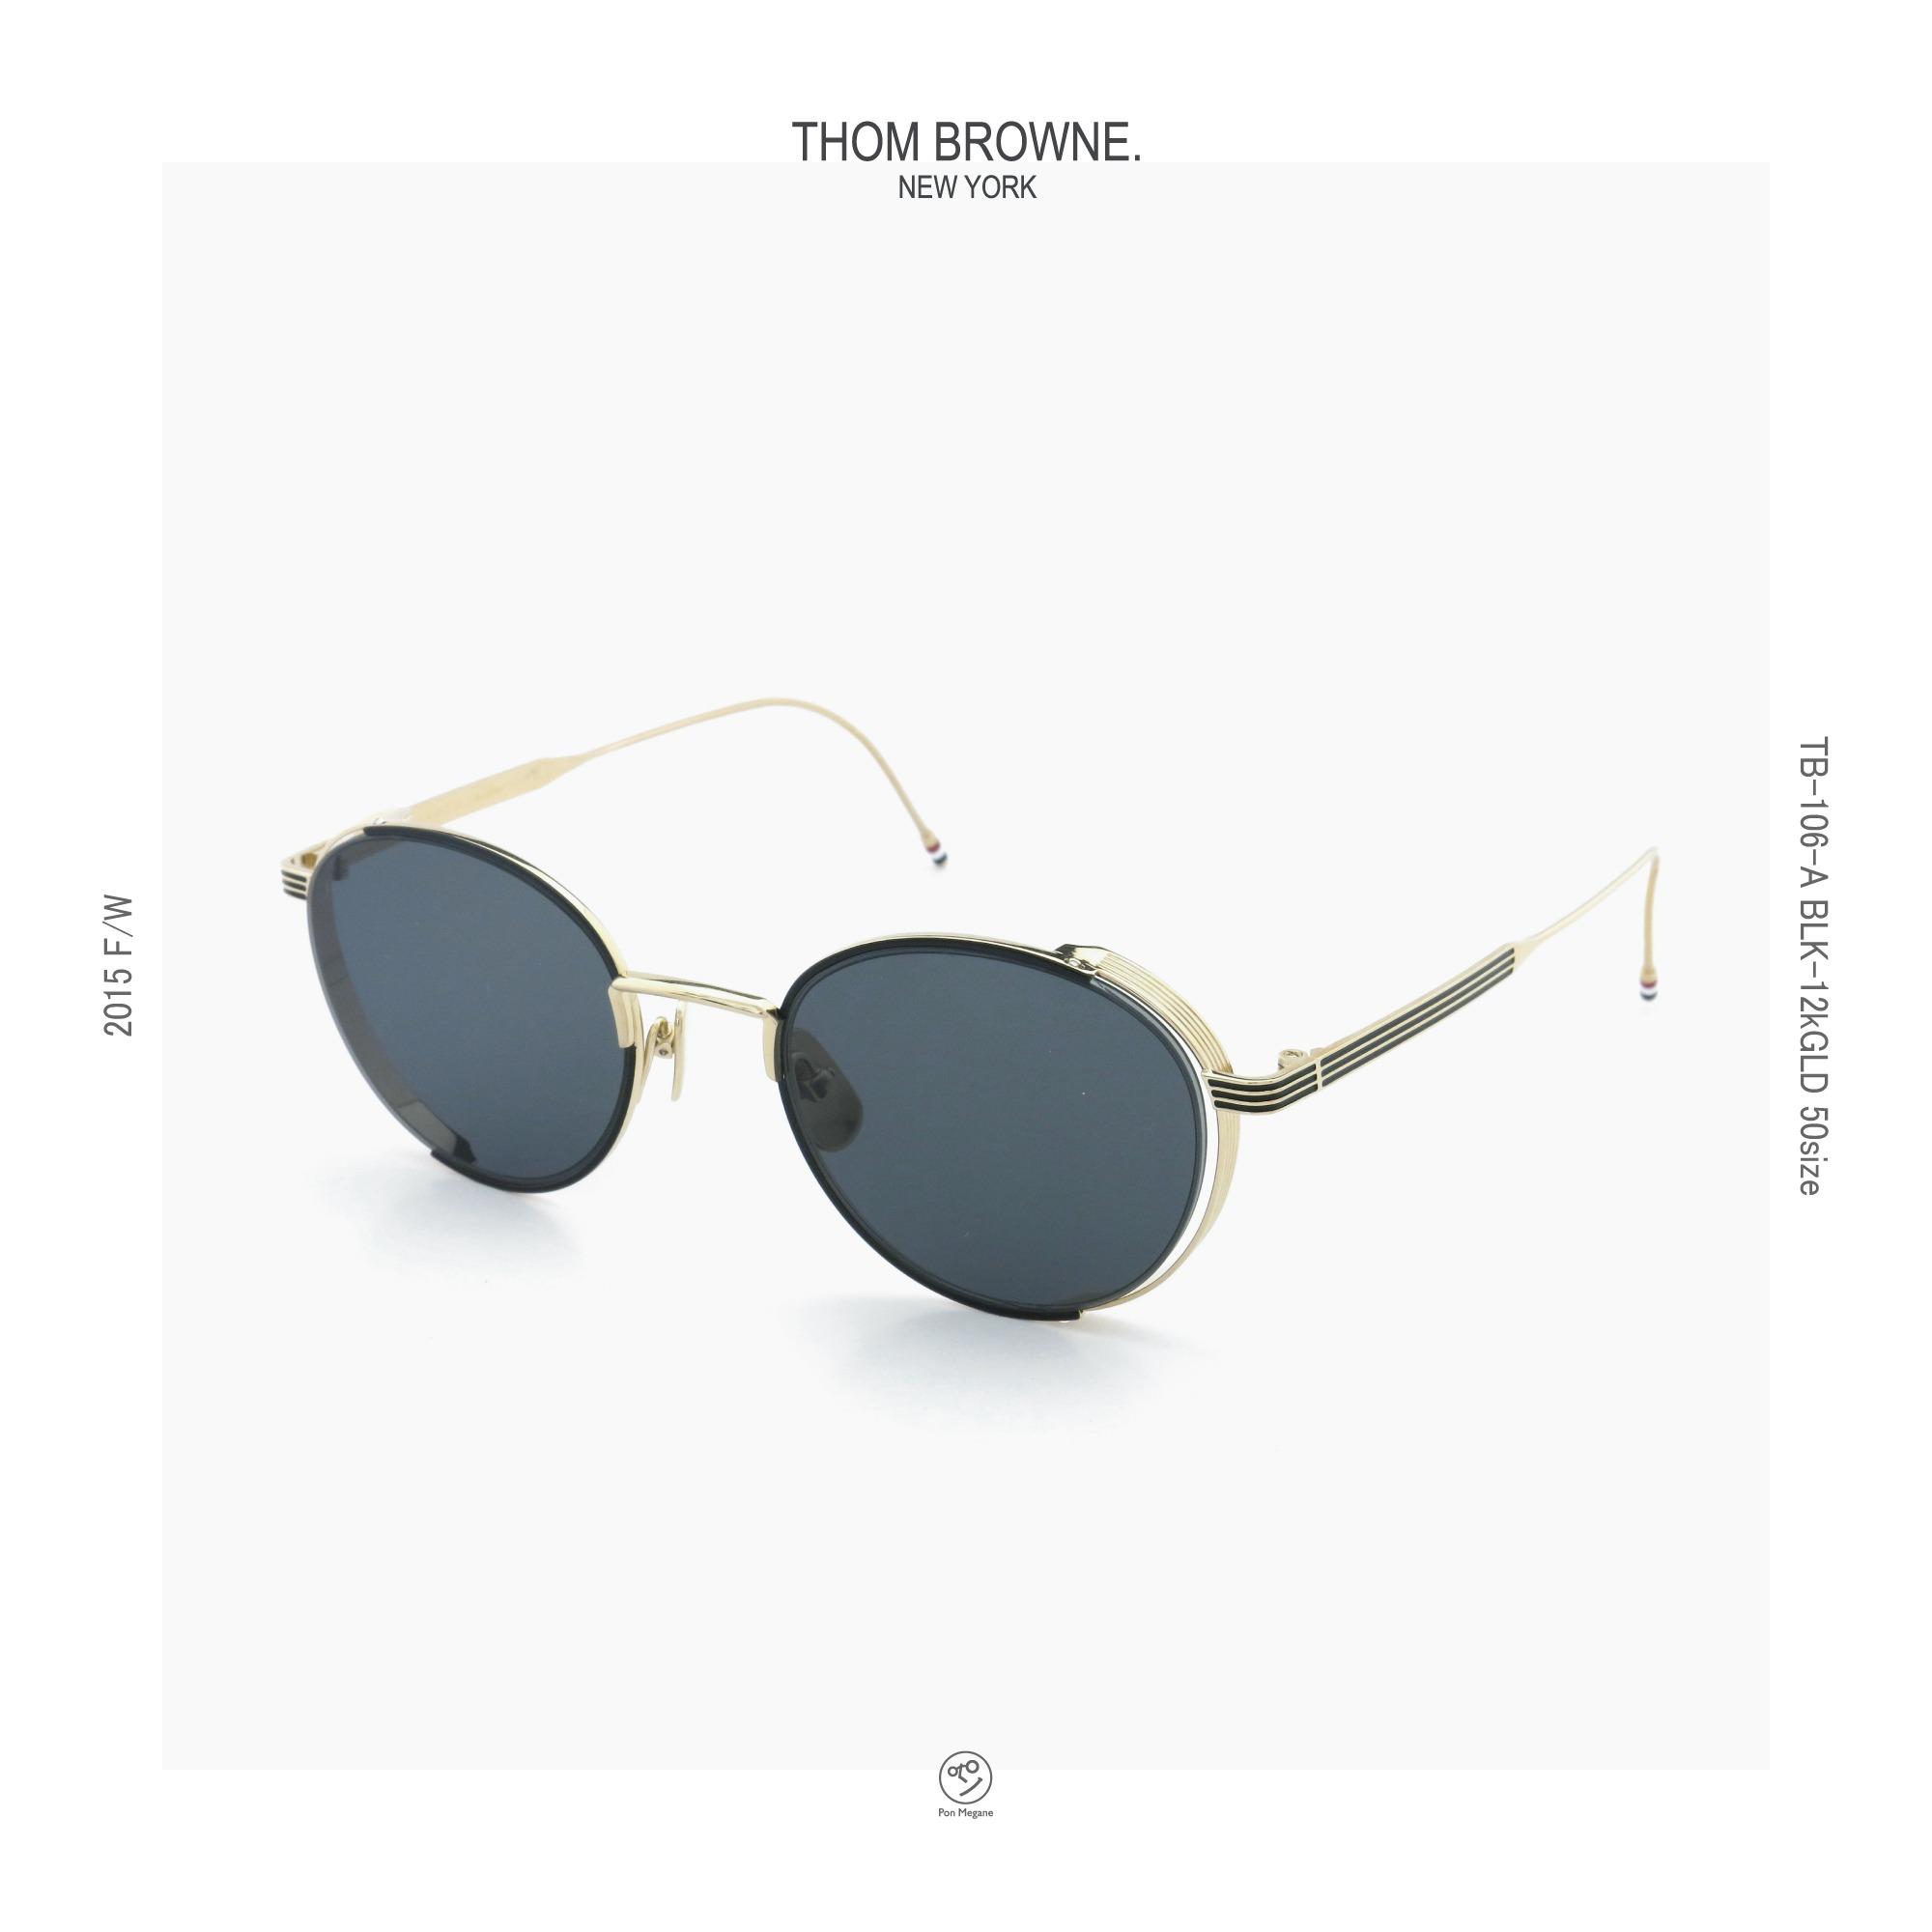 THOM-BROWNE-TB-106-A-BLK-12kGLD-50-DG-instagram